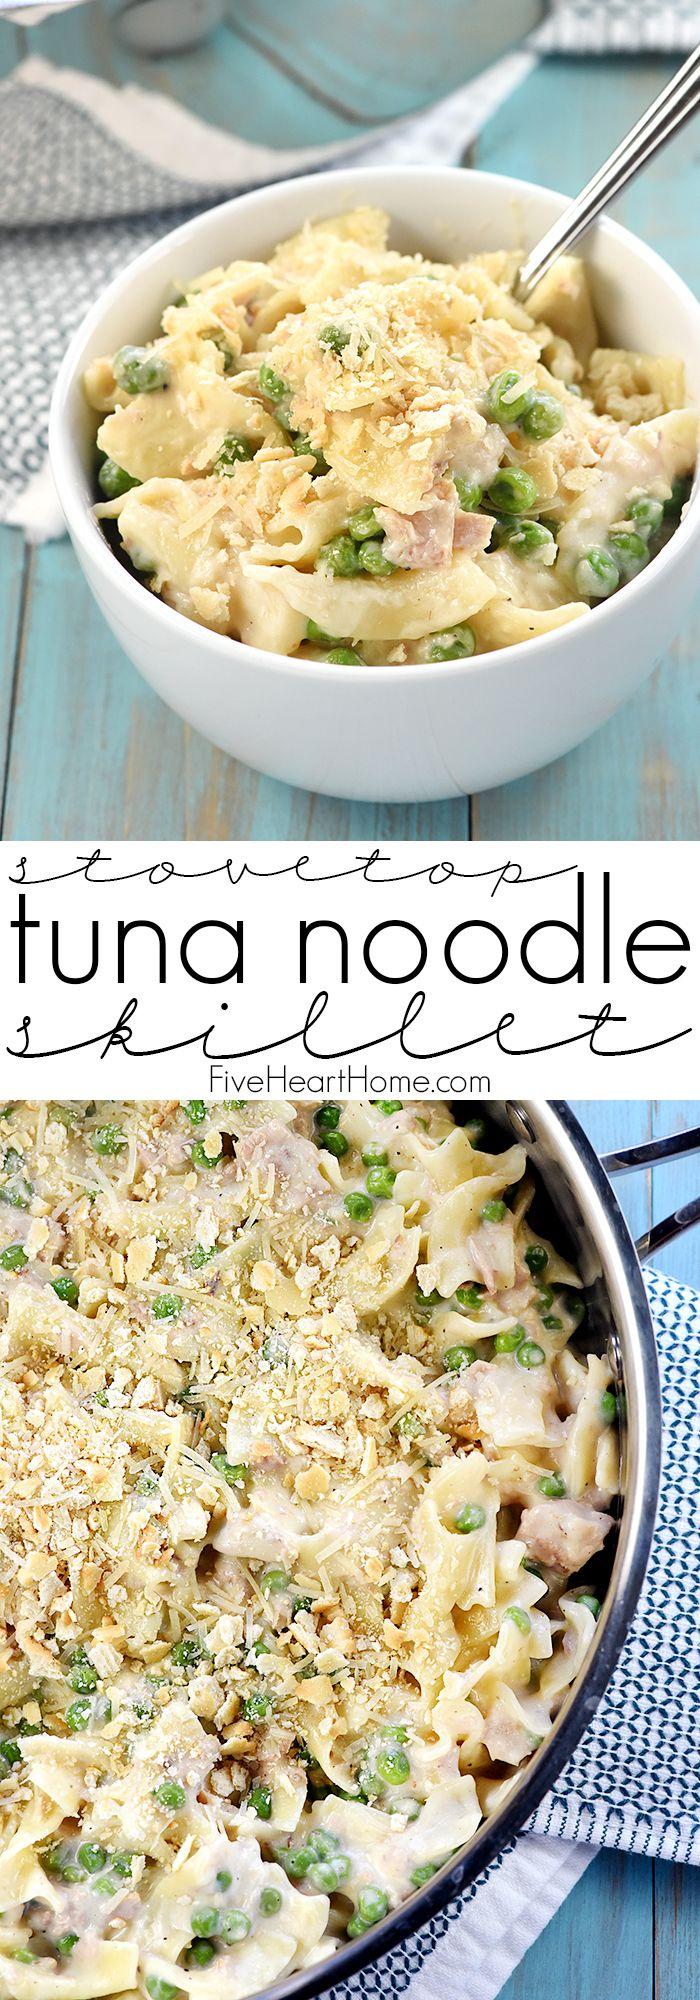 Best 25 tuna casserole healthy ideas on pinterest tuna for How to make tuna fish casserole